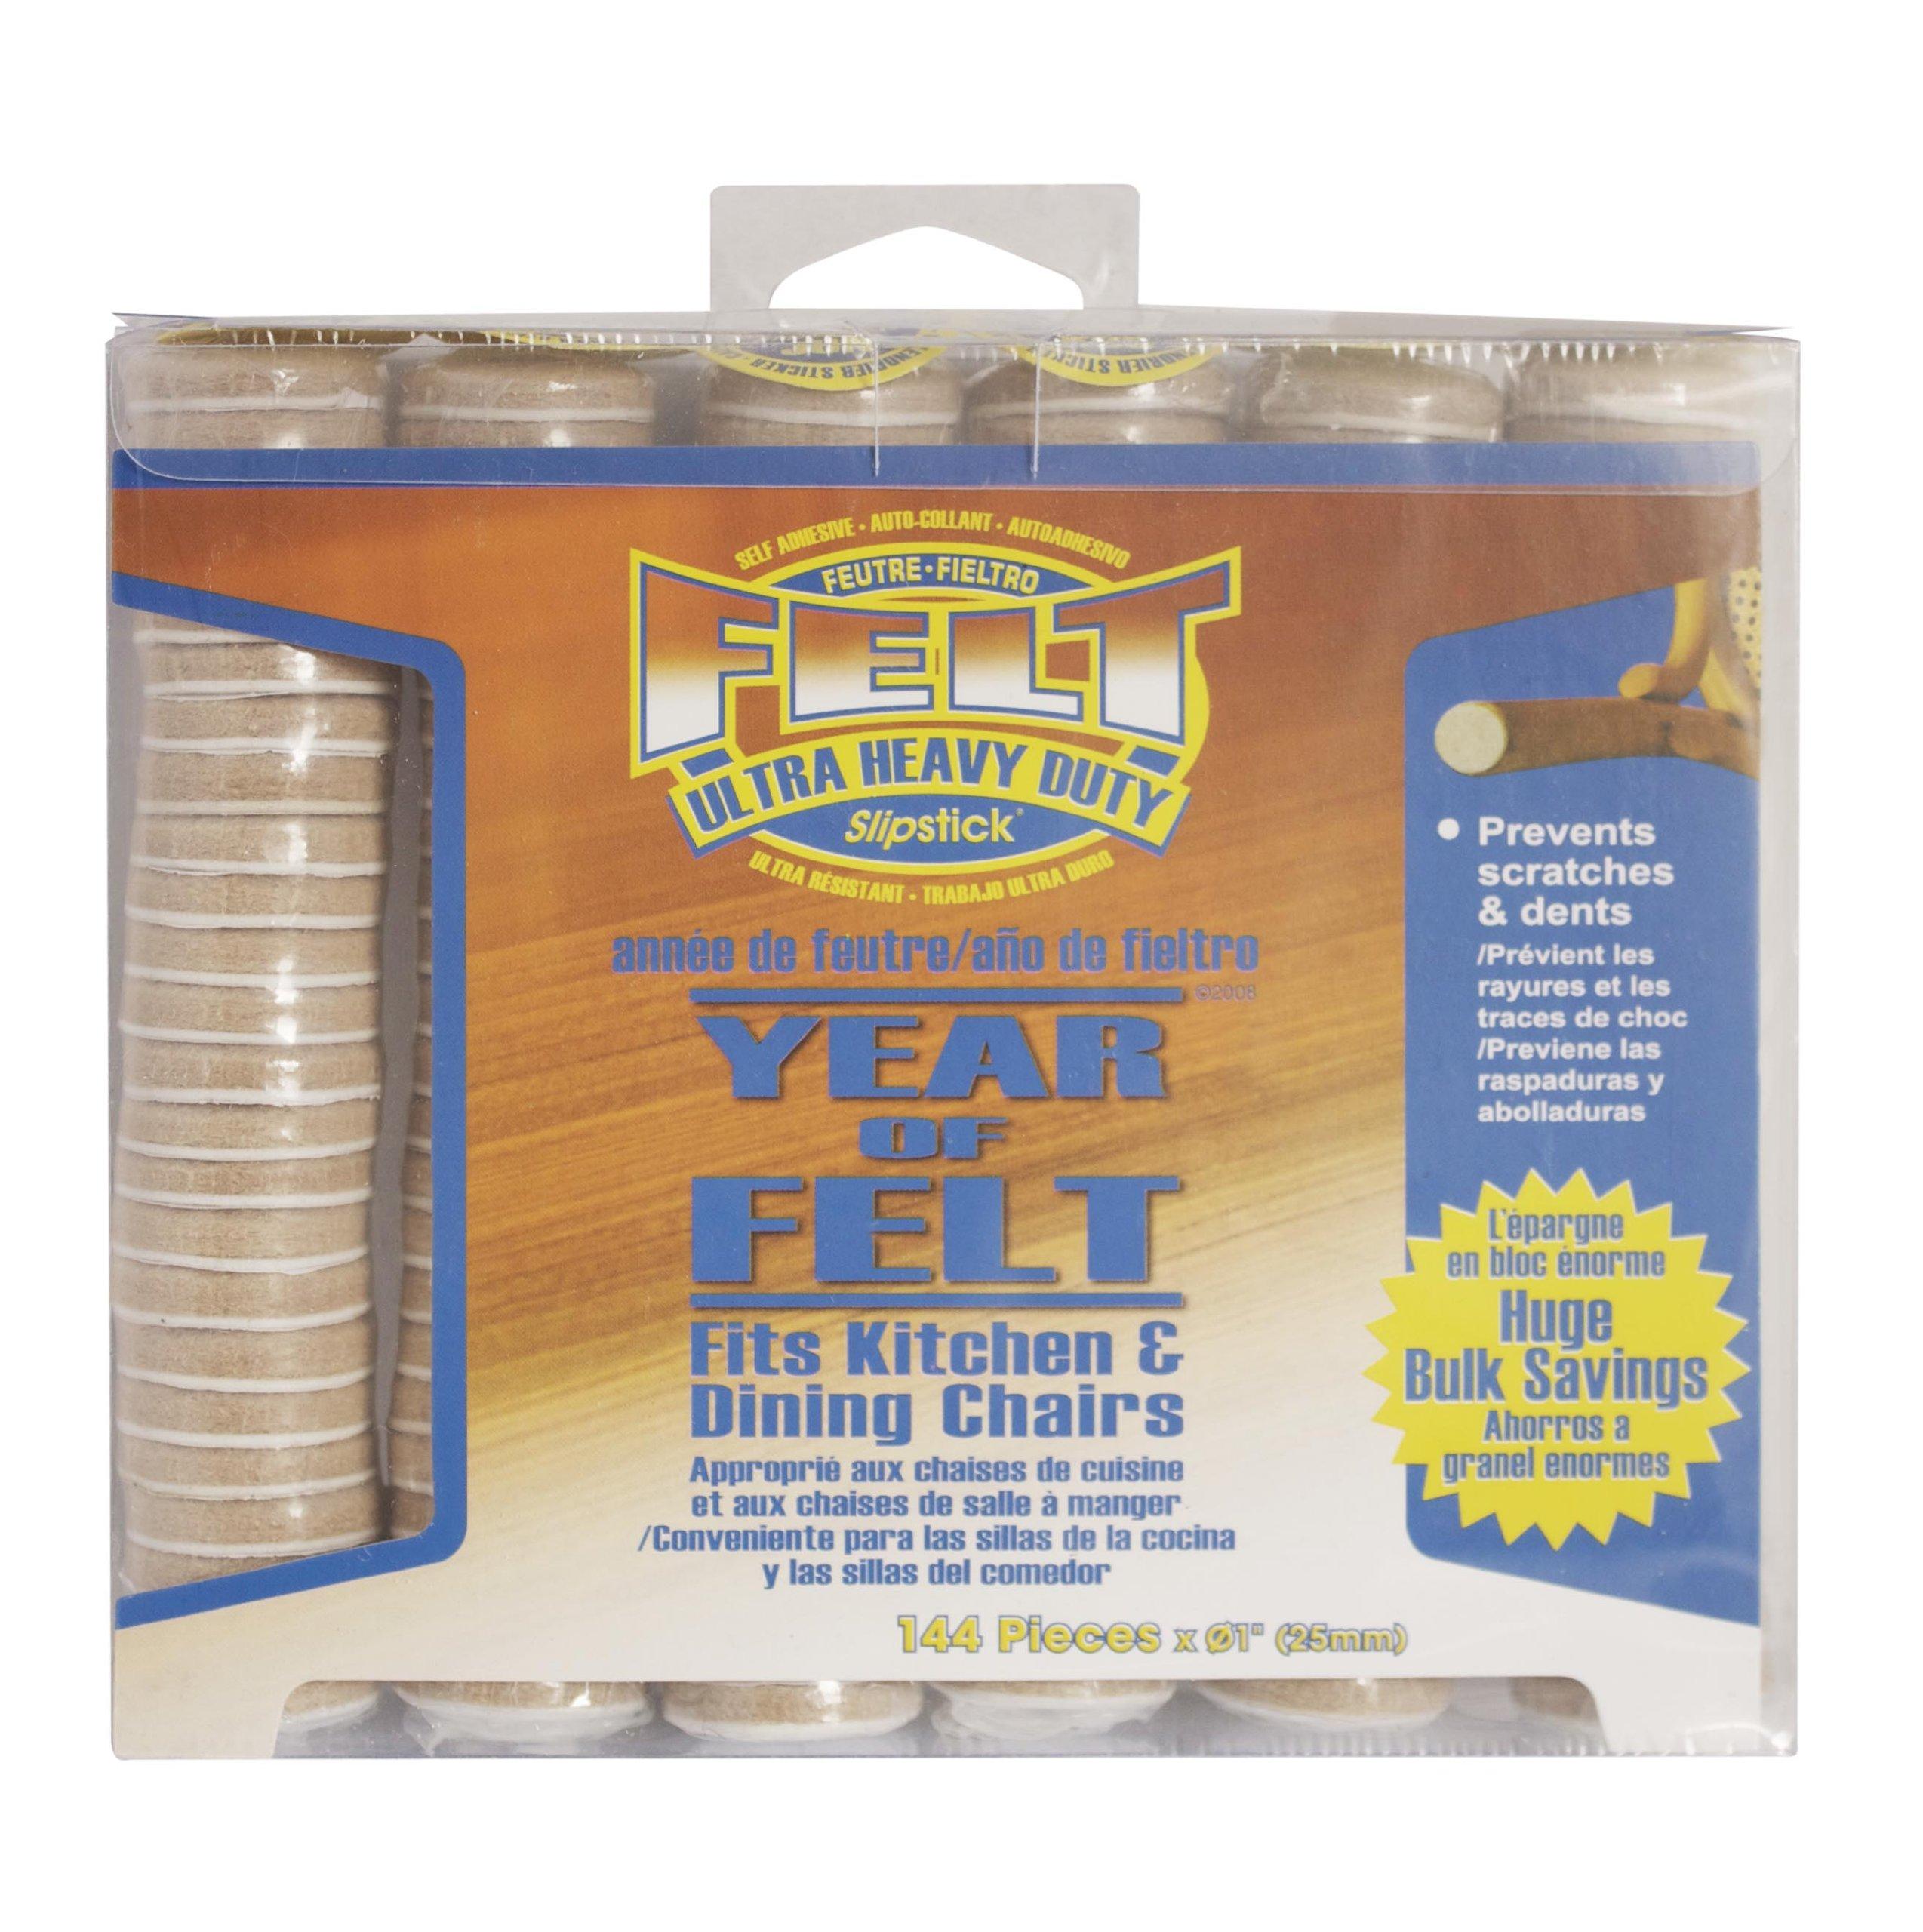 Slipstick CB113 1 Inch Self Stick Felt Pads / Furniture Floor Protectors (144 Piece Value Pack) Round Adhesive Felt Sliders